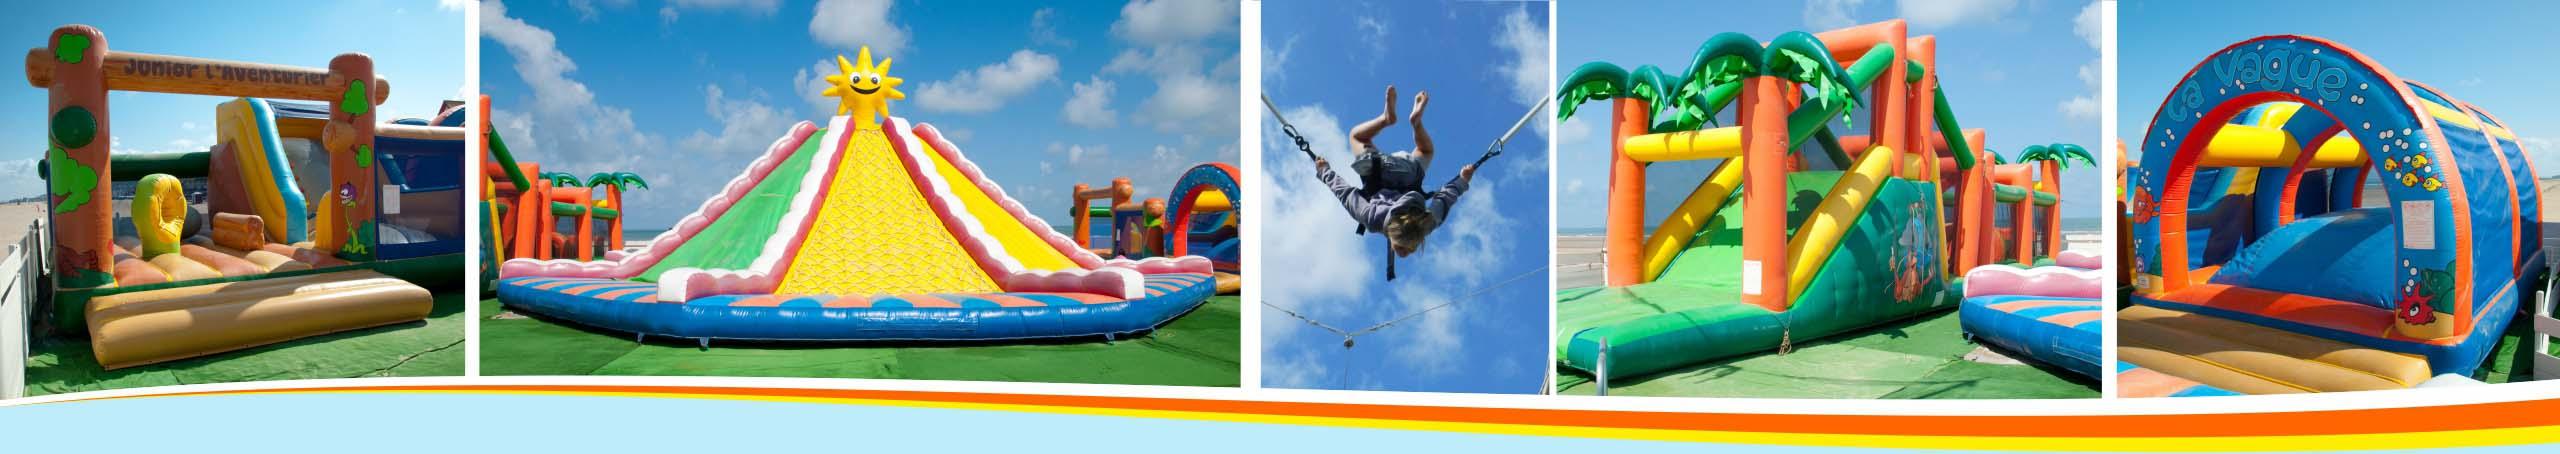 location attractions jeux enfants structure gonflable trampoline vacances hiver